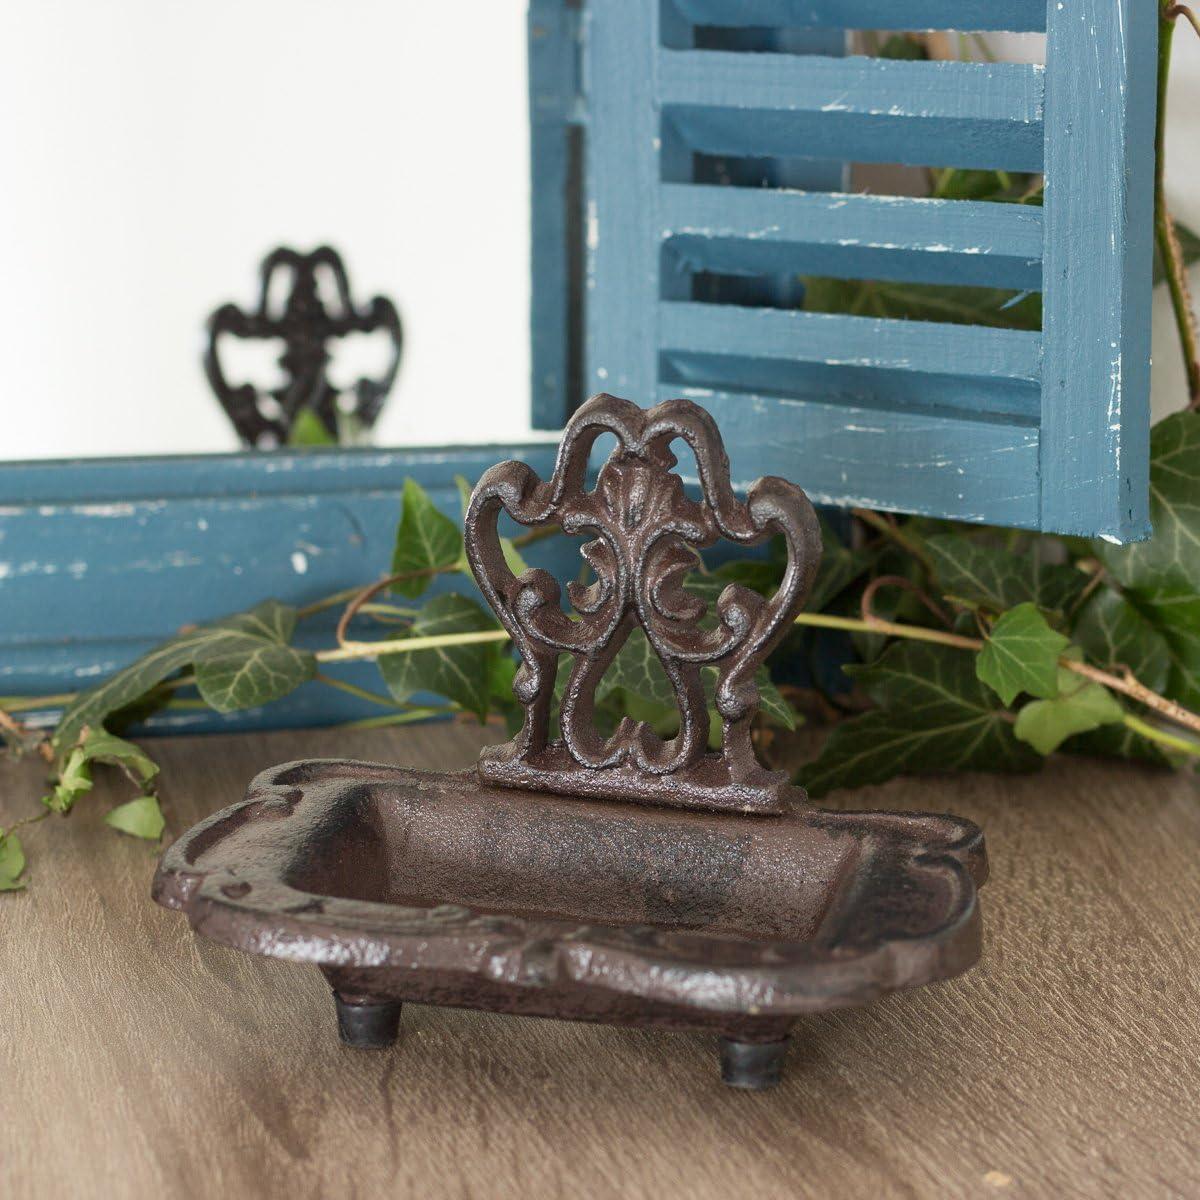 Antikas - Jabonera rústica, Soporte de jabón como Antiguo, dispensador de jabón en Estilo rústico